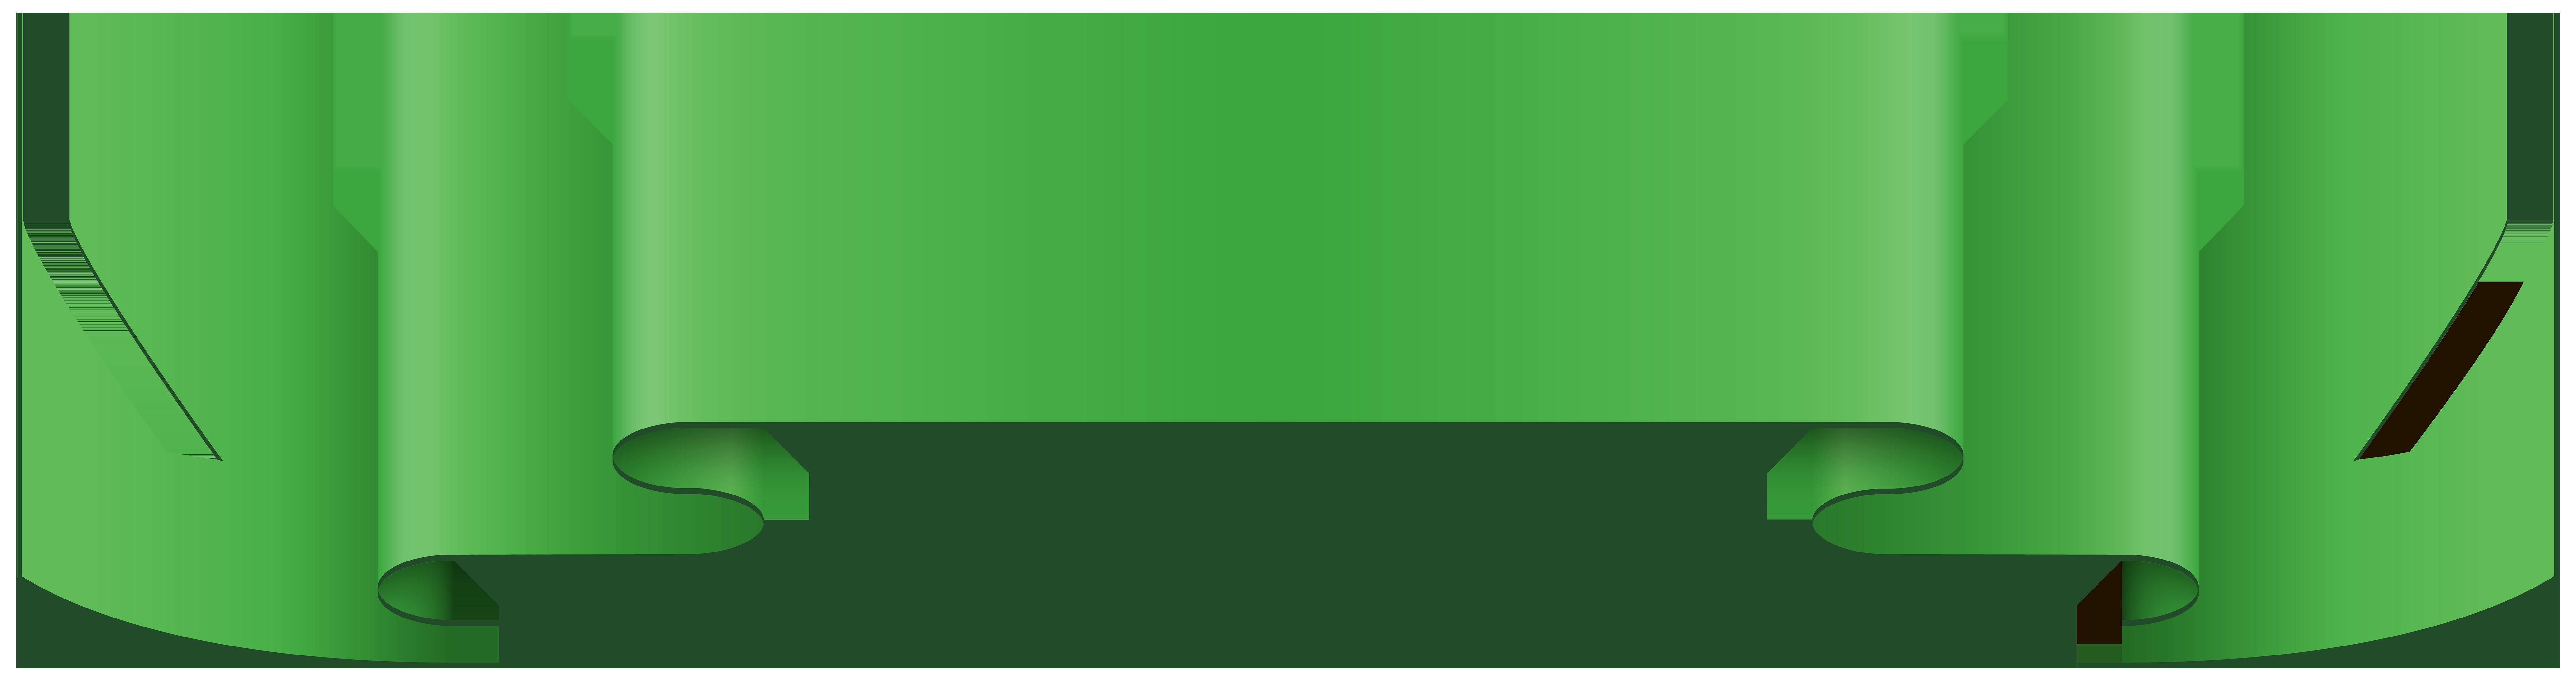 Banner Green Clip Art PNG Image.